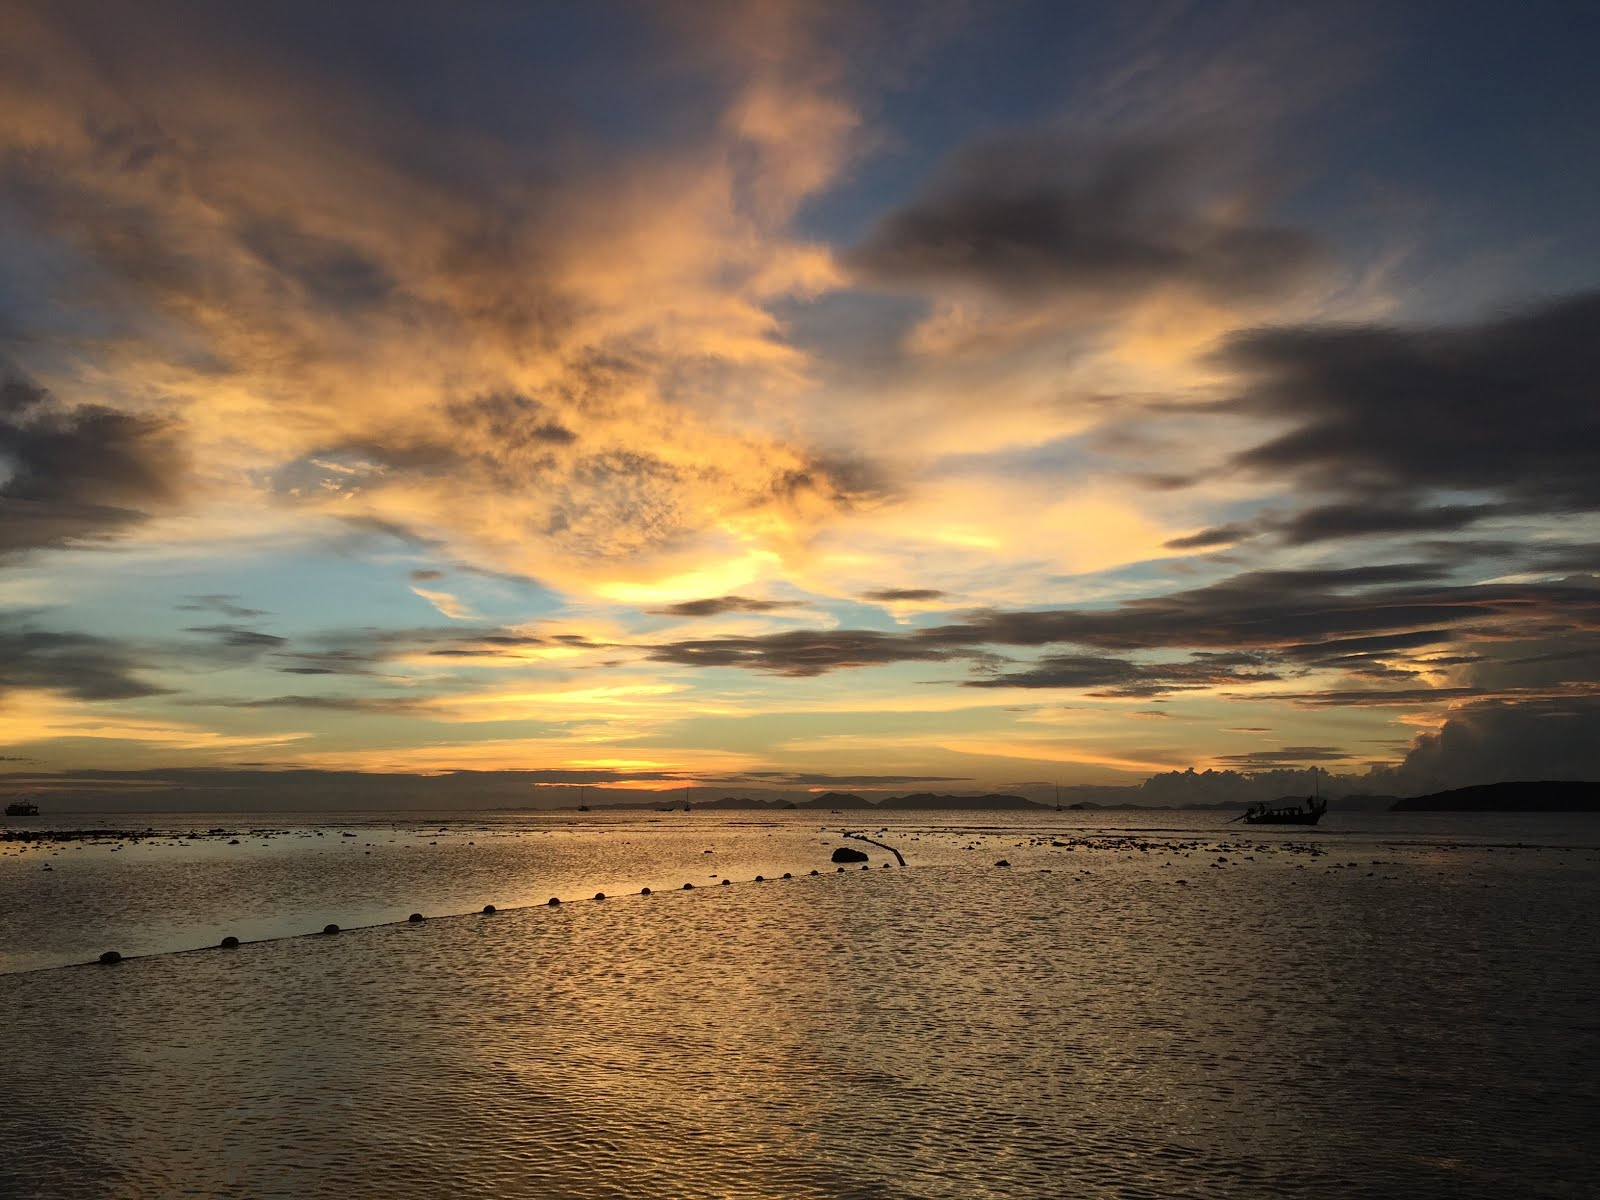 Sunset at Krabi Beach, Thailand, Asia